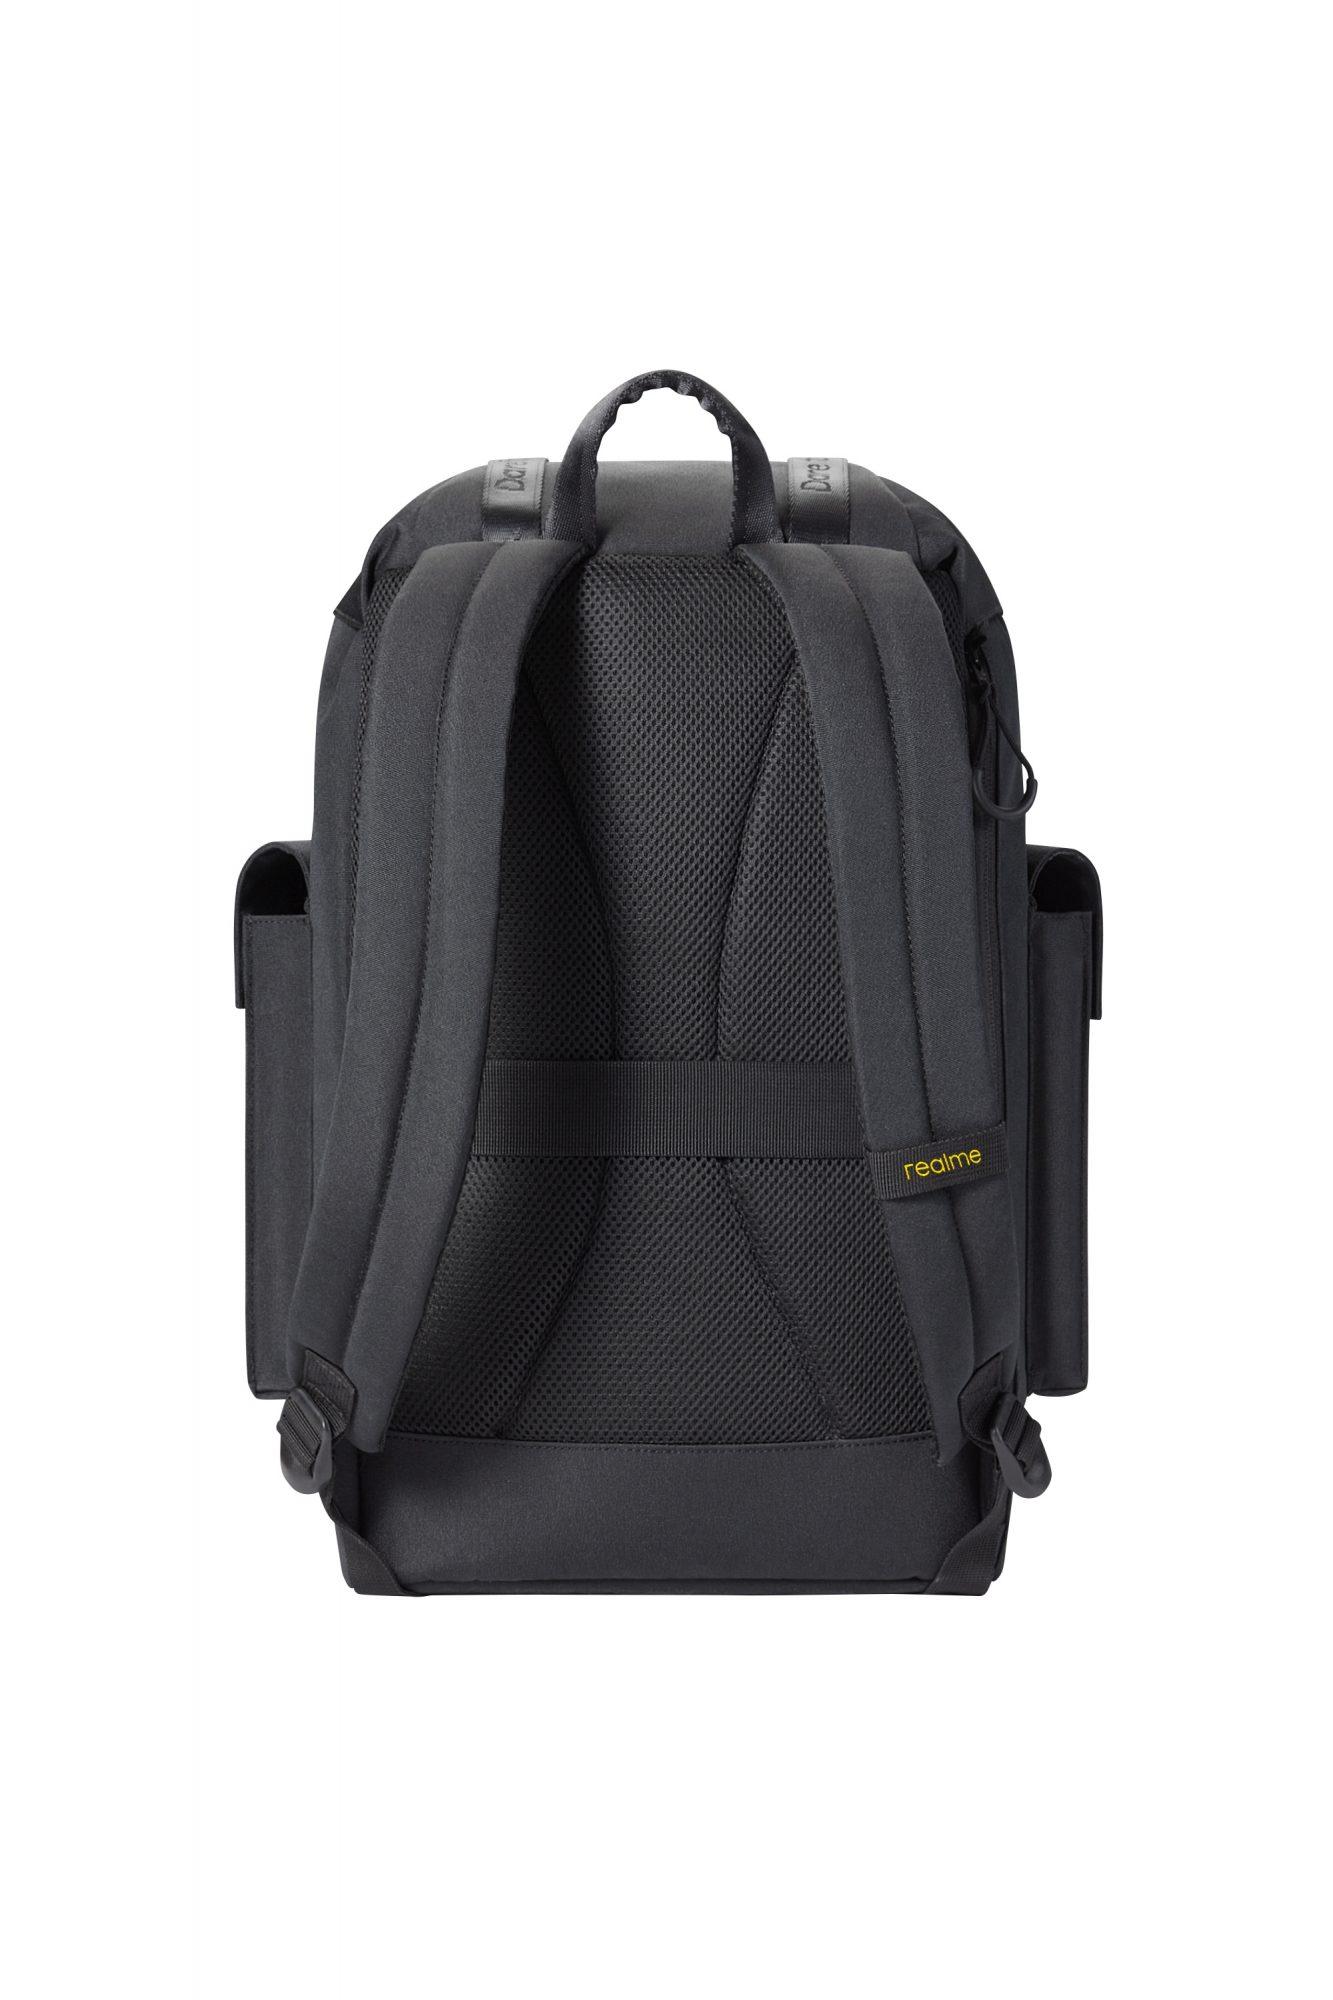 realme Adventure Backpack 3